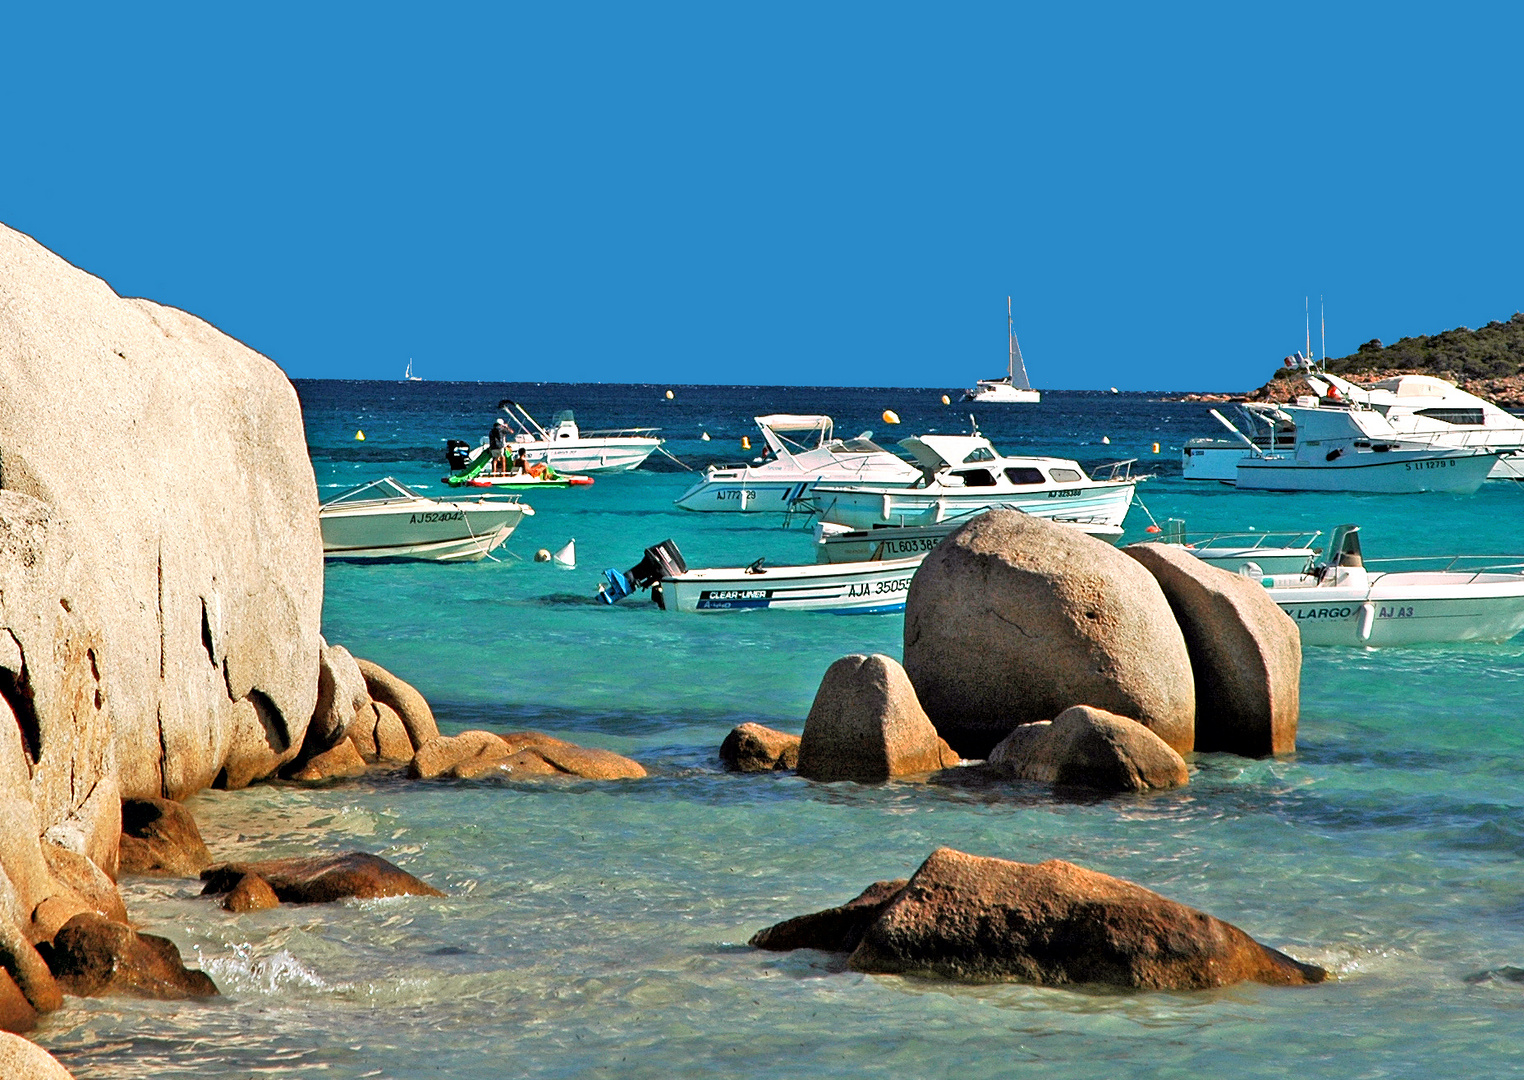 Rochers de la plage de Santa Guillia (Corse)